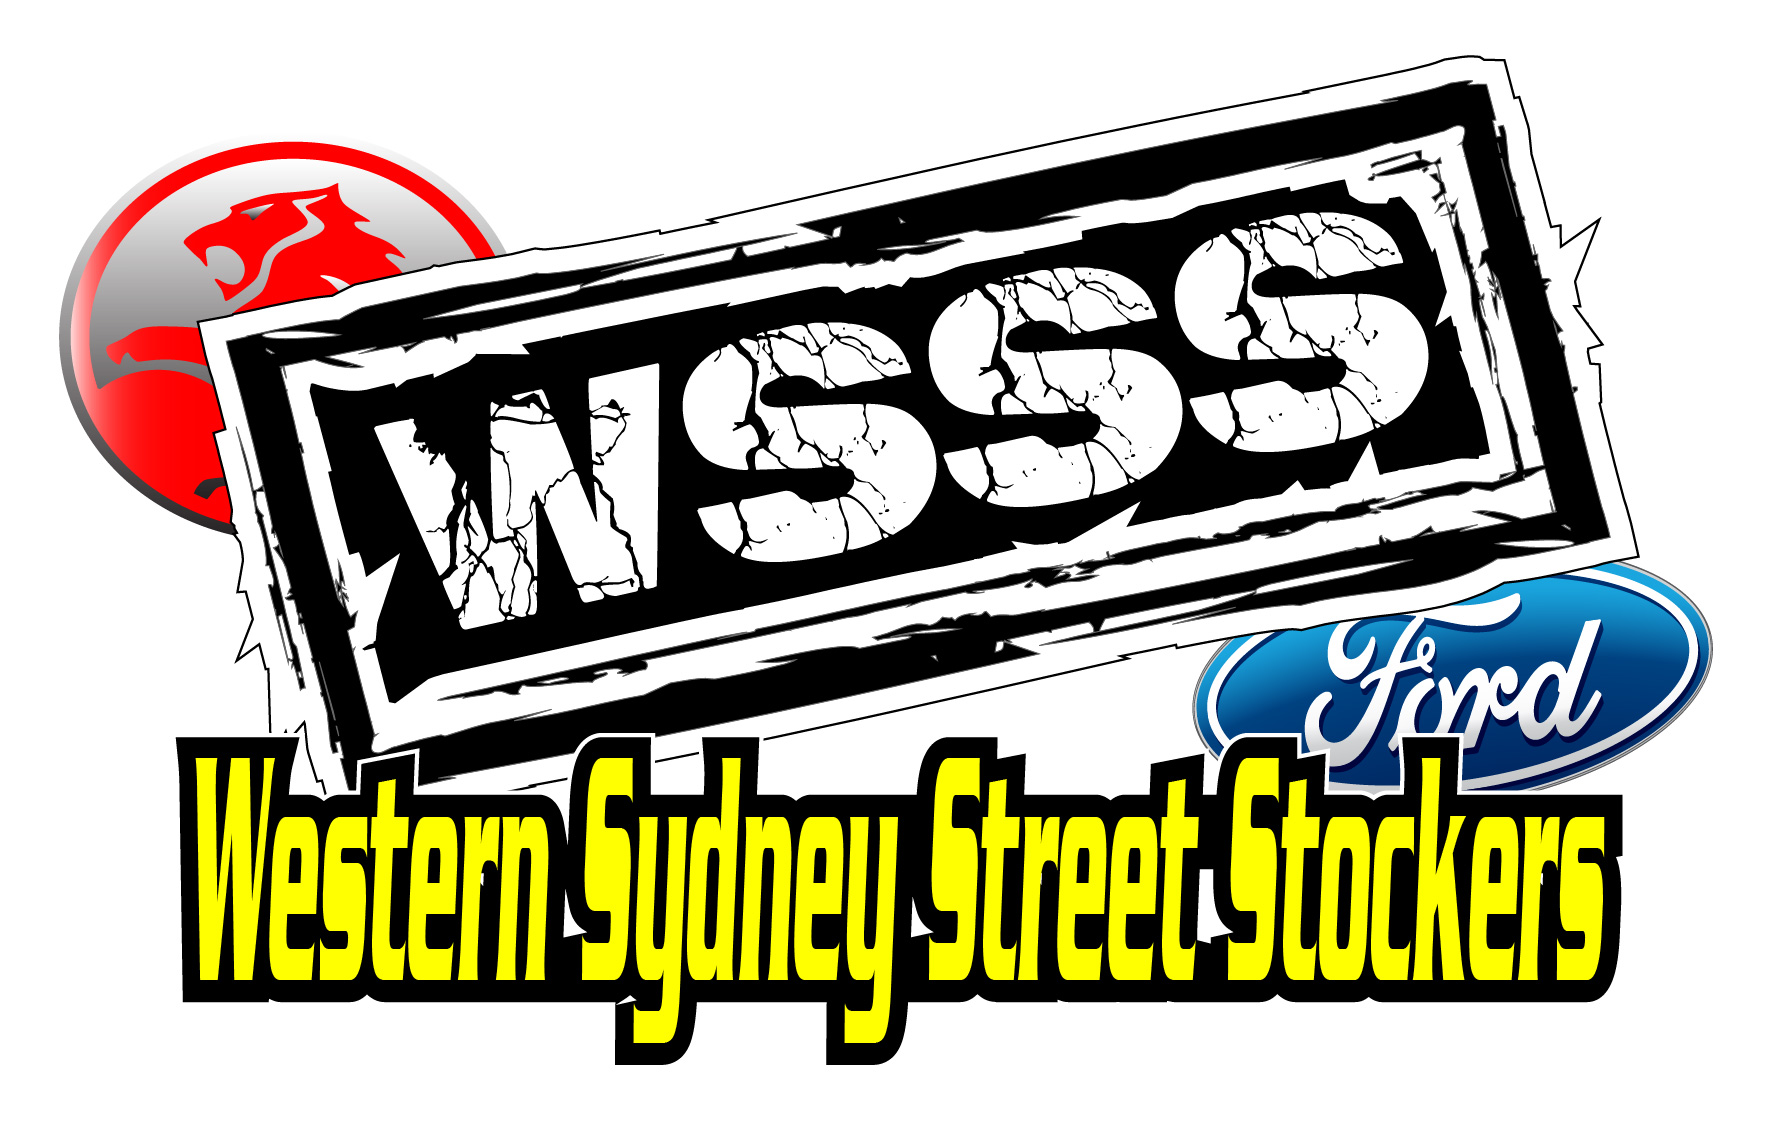 Western Sydeny Street Stockers